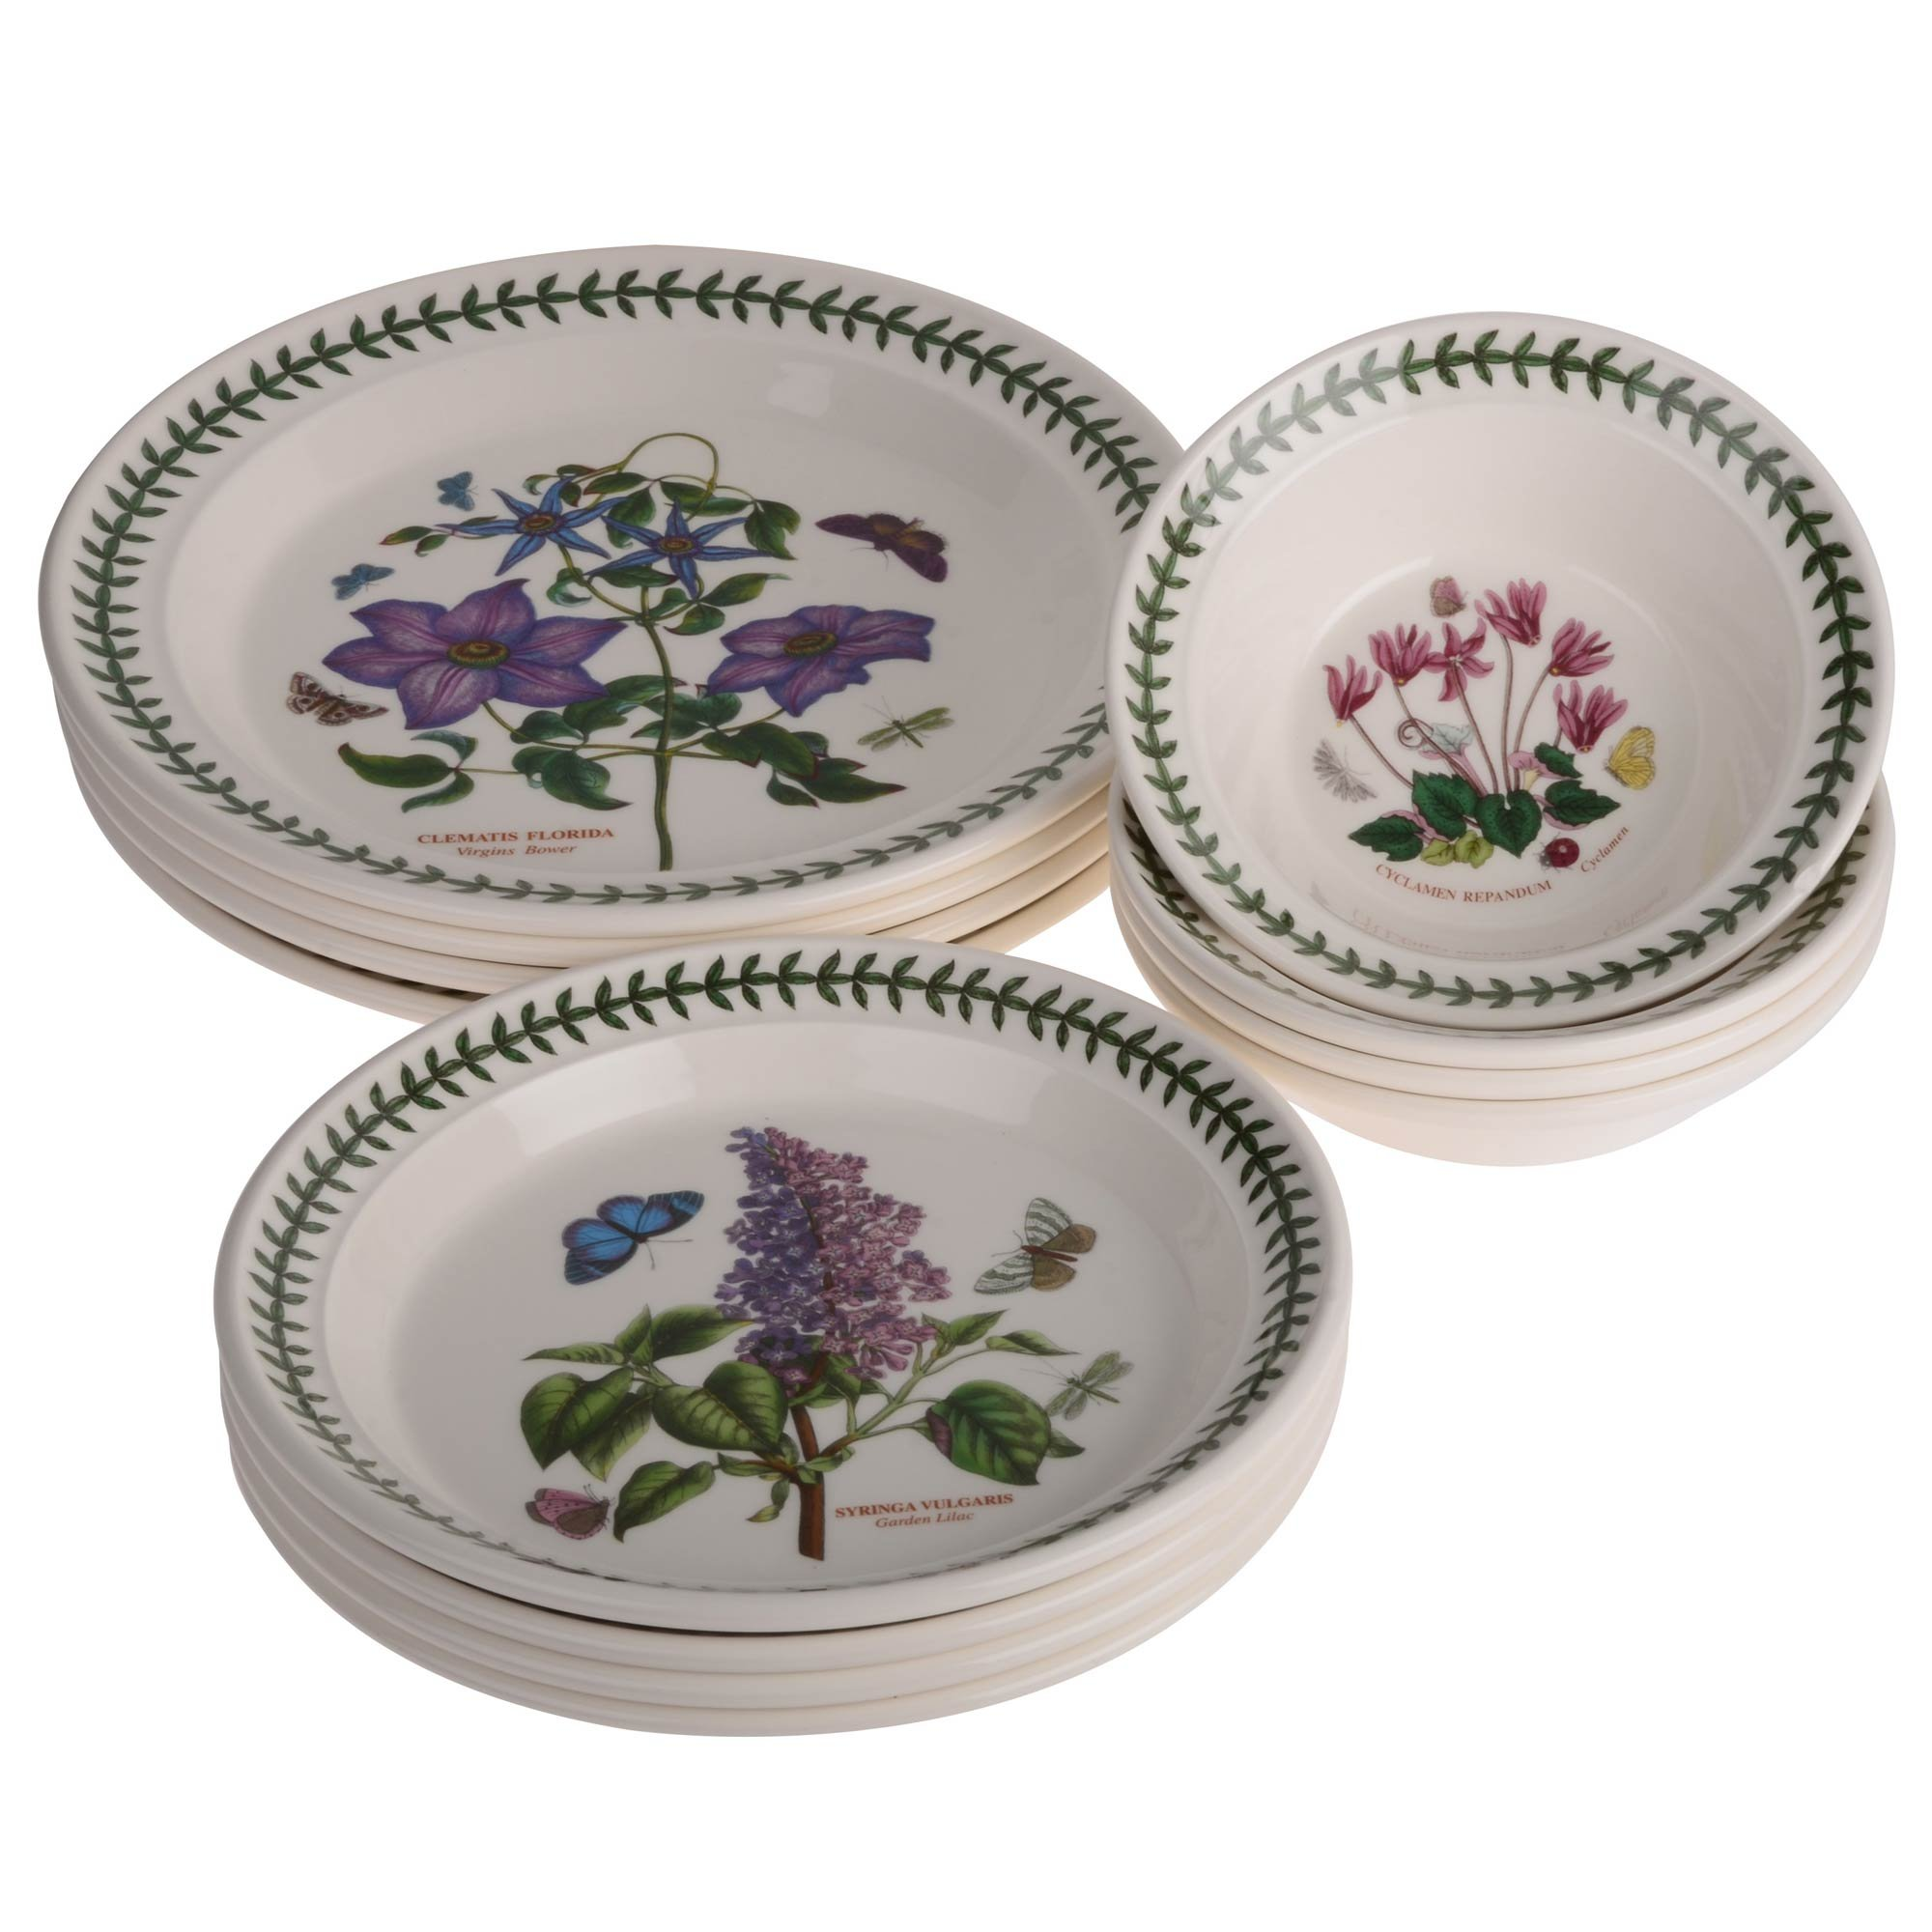 Portmeirion 12 Piece 'Botanic Garden' Set - 4 x Dinner Plates, 4 x Side Plates & 4 x Bowls